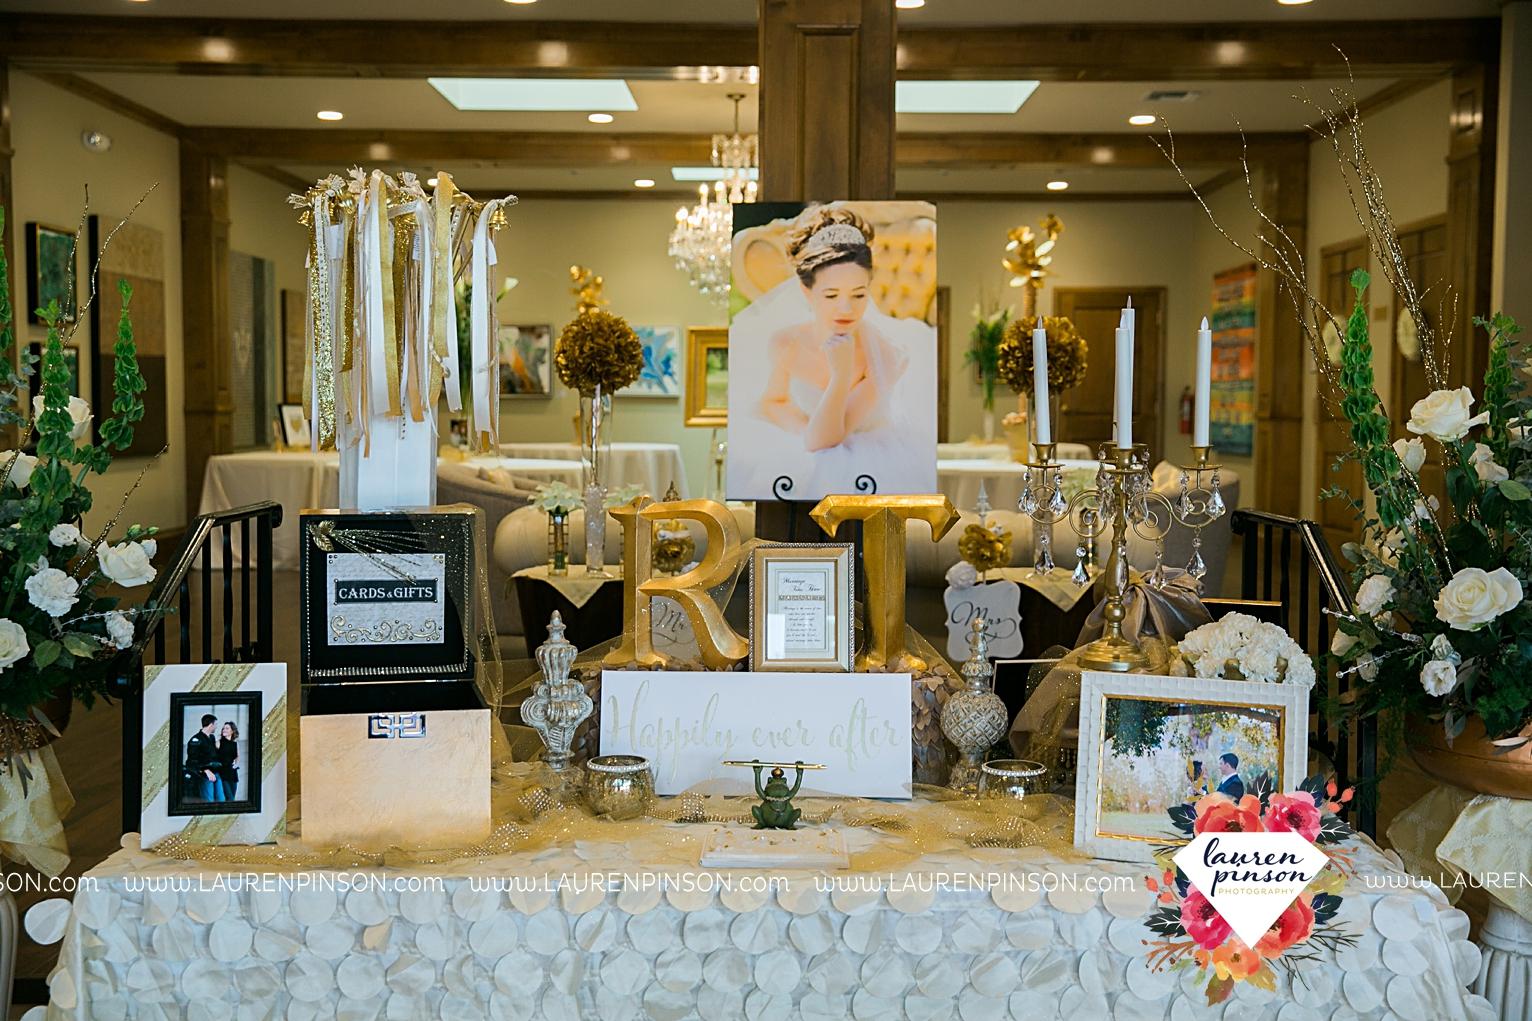 wichita-falls-texas-wedding-photographer-the-forum-by-the-kemp-mayfield-events-ulta-gold-glitter_2852.jpg